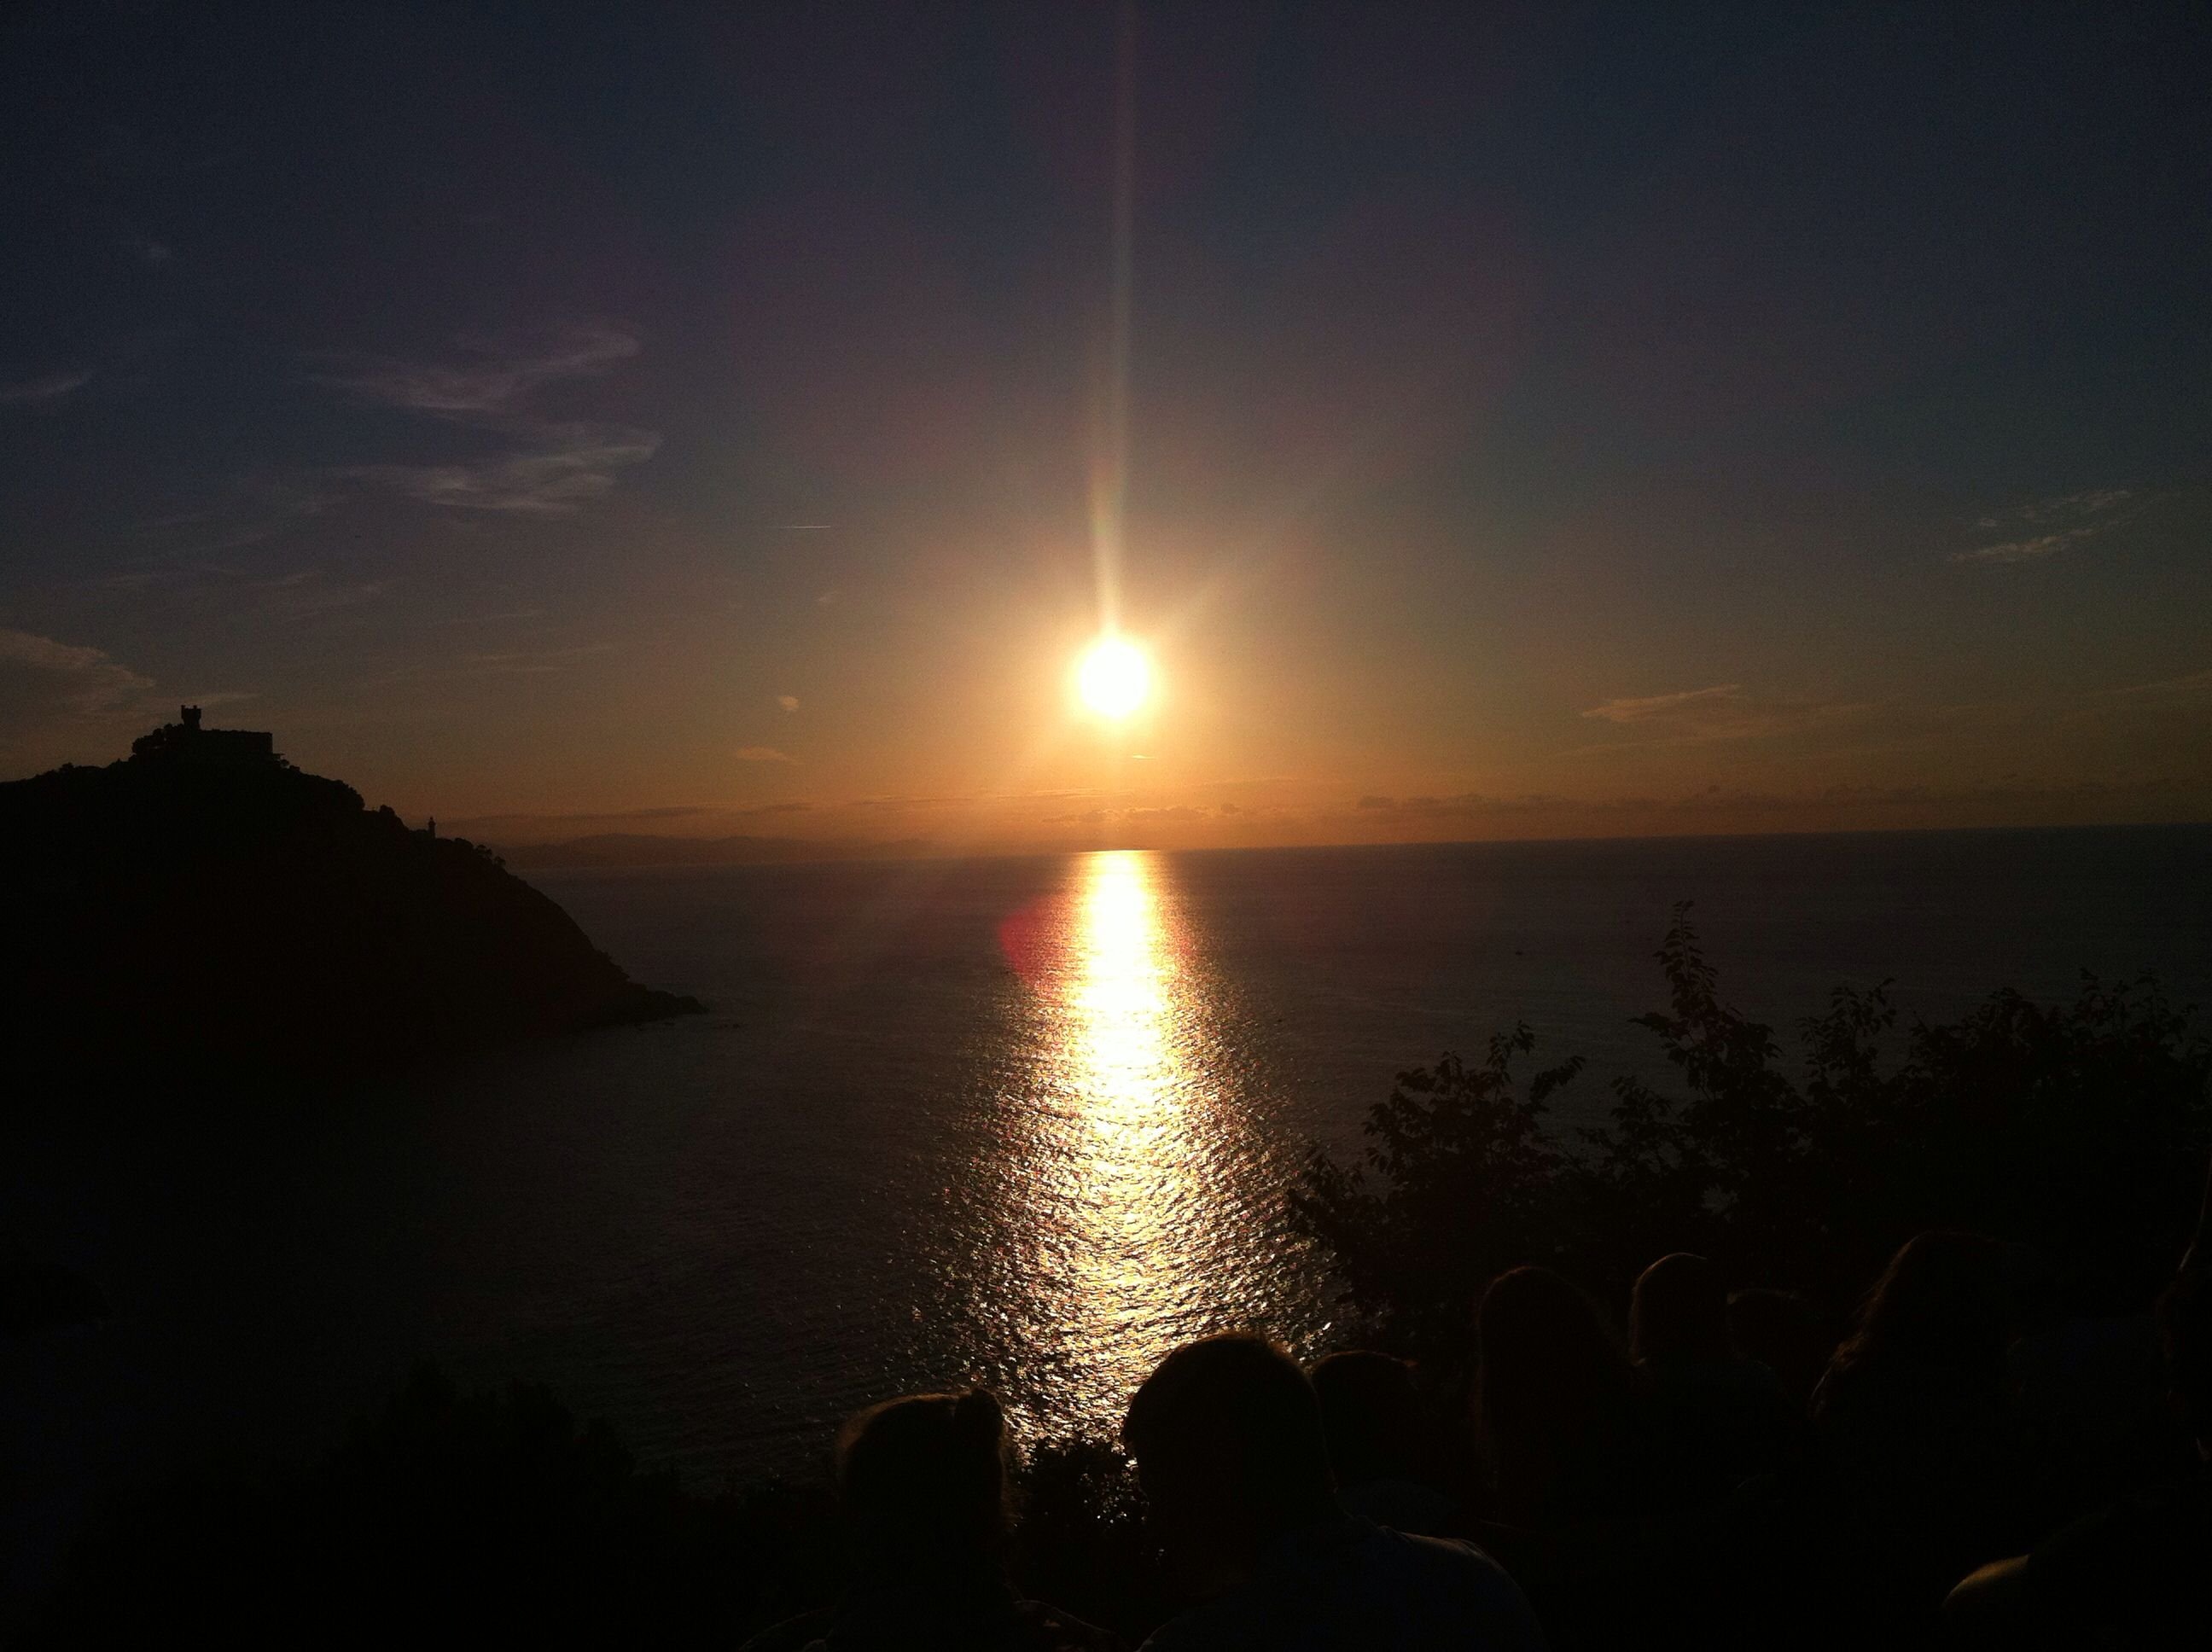 Sunset in San Sebastian / Donostia